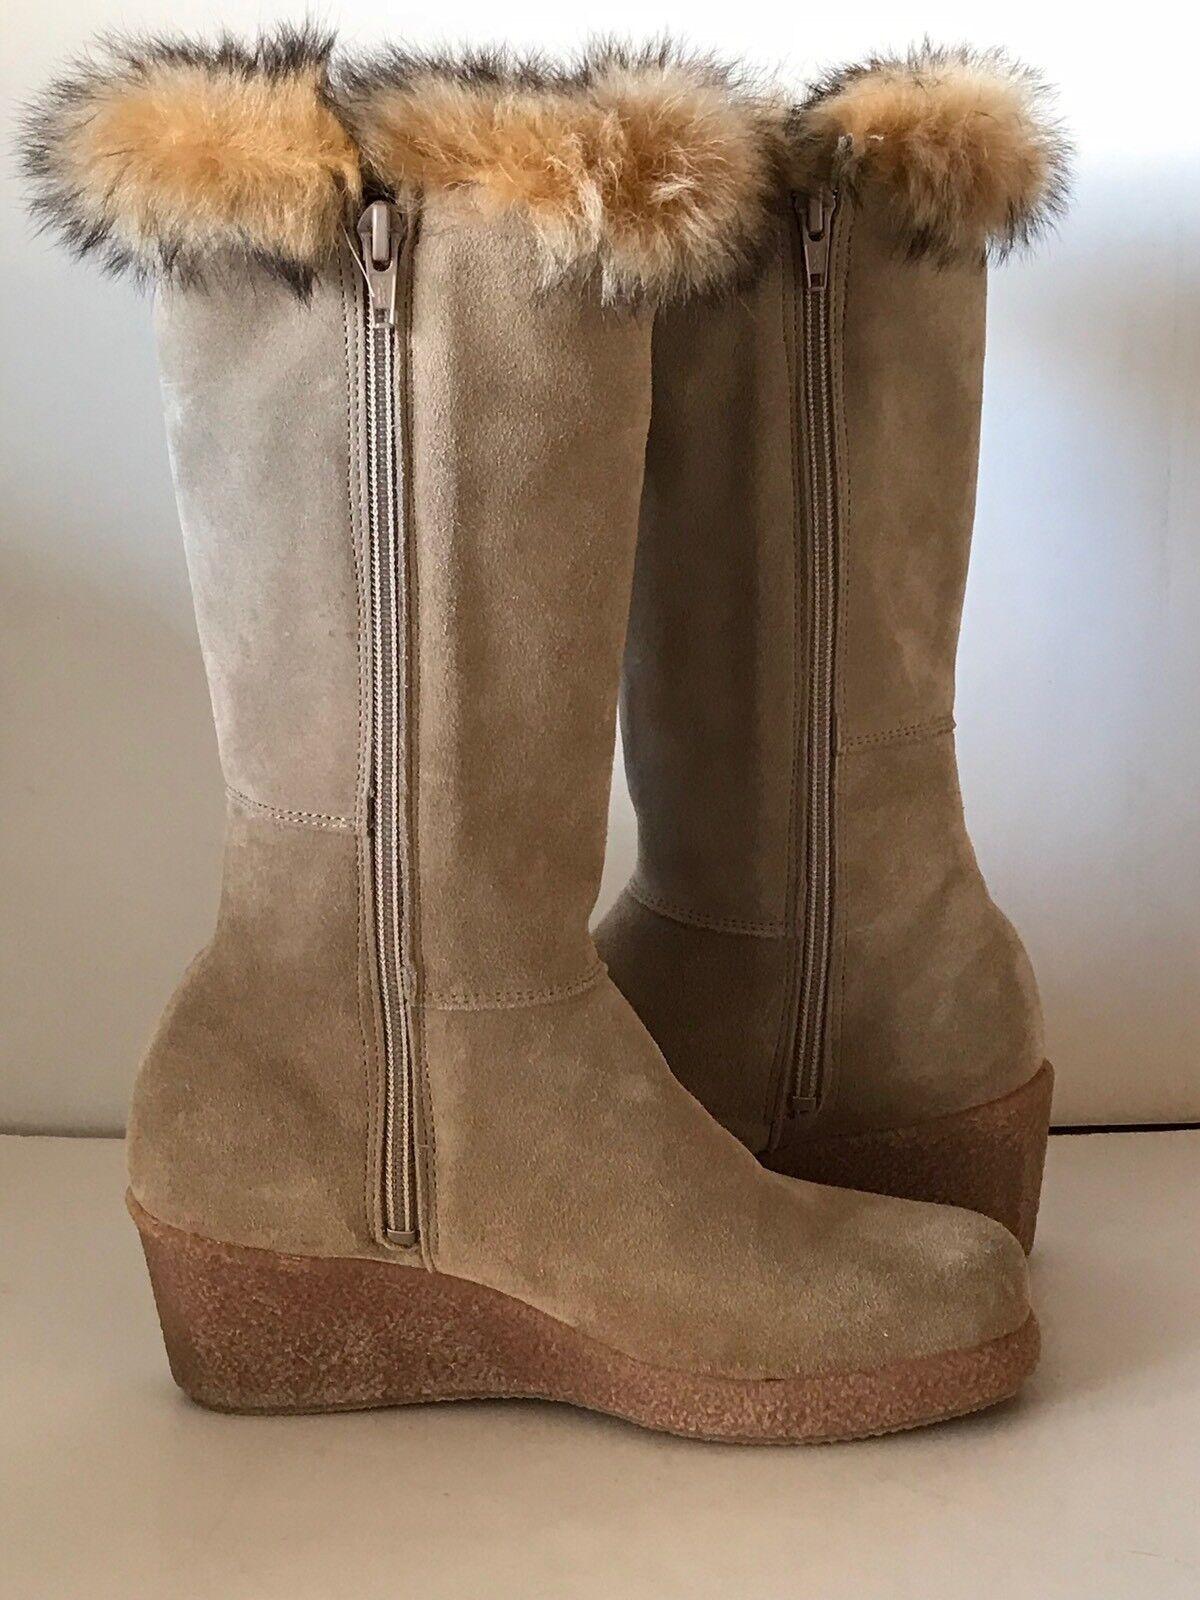 NWOB MAXINE OF CANADA Beige Suede Fur Mid-Calf NEW Boots Size 6M 36 NEW Mid-Calf Waterproof 1b1b3f